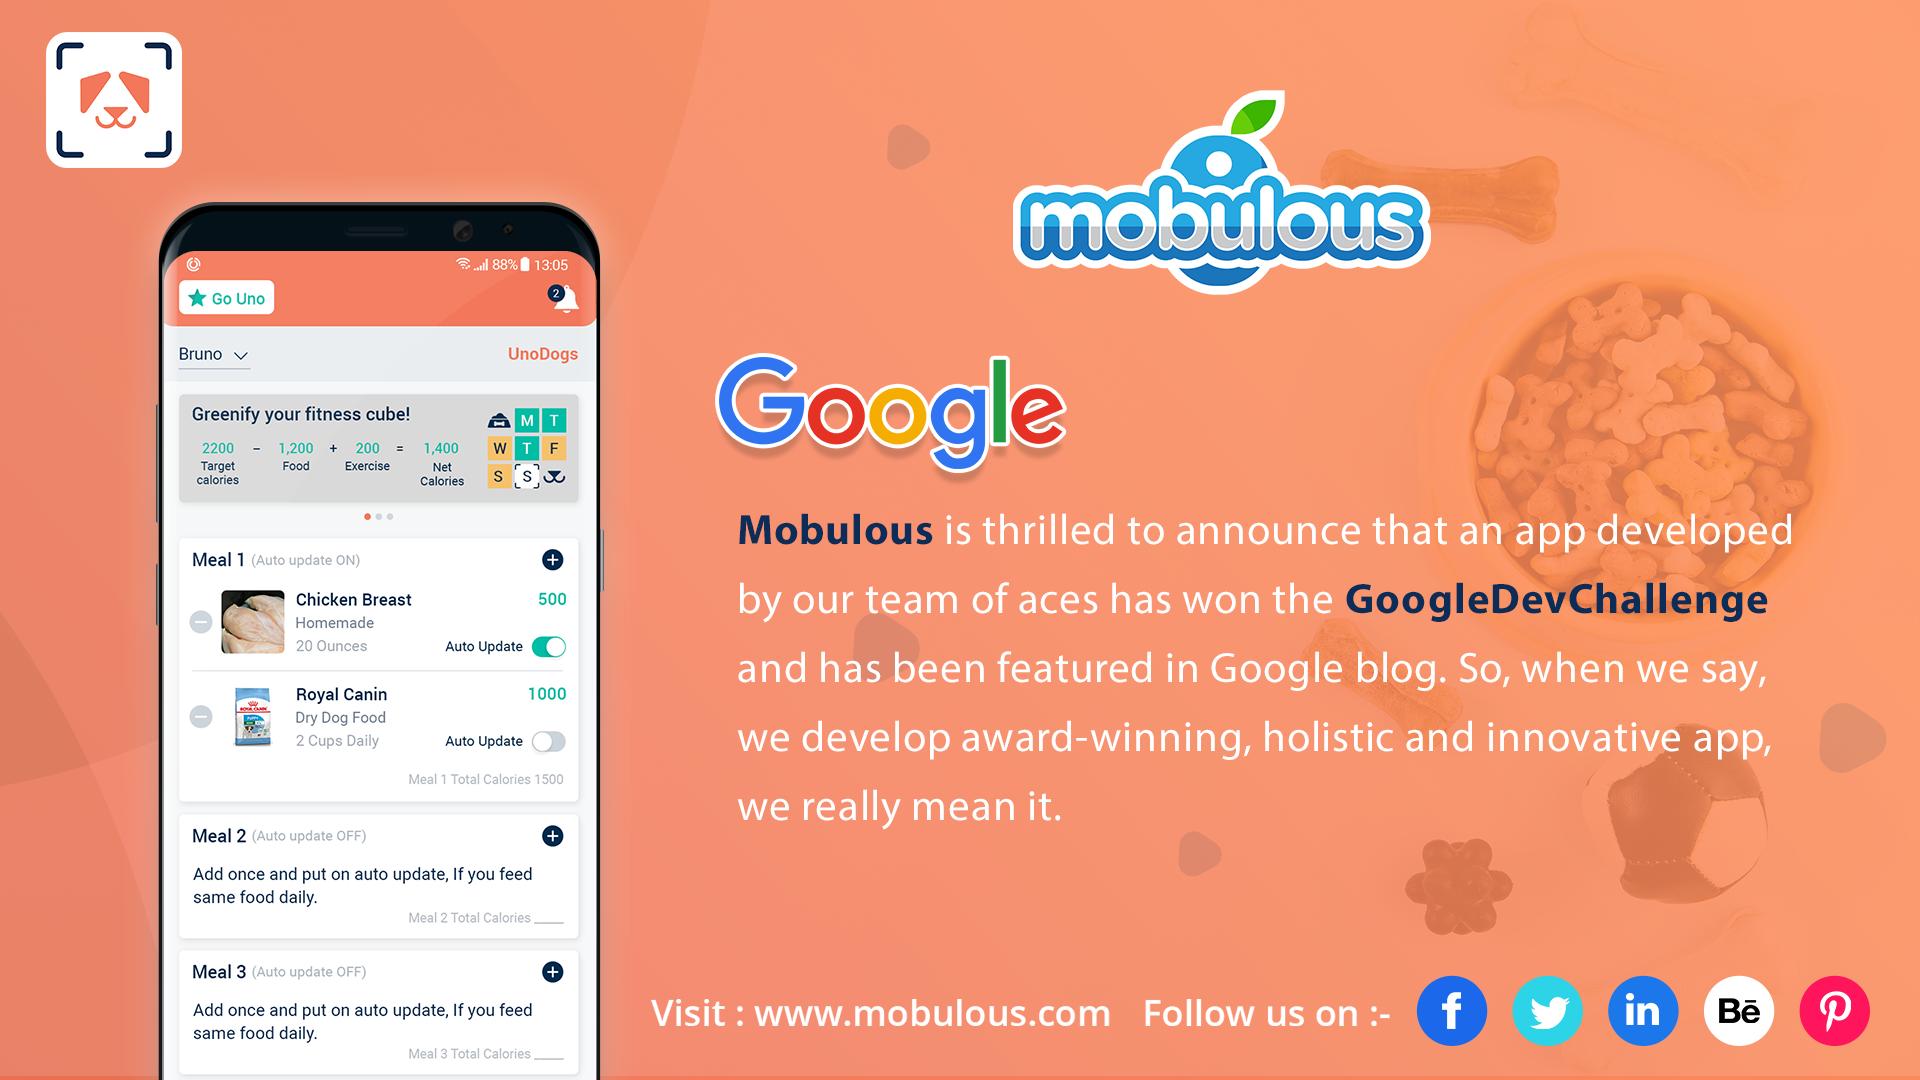 unodogs_app_featured_in_google_blog